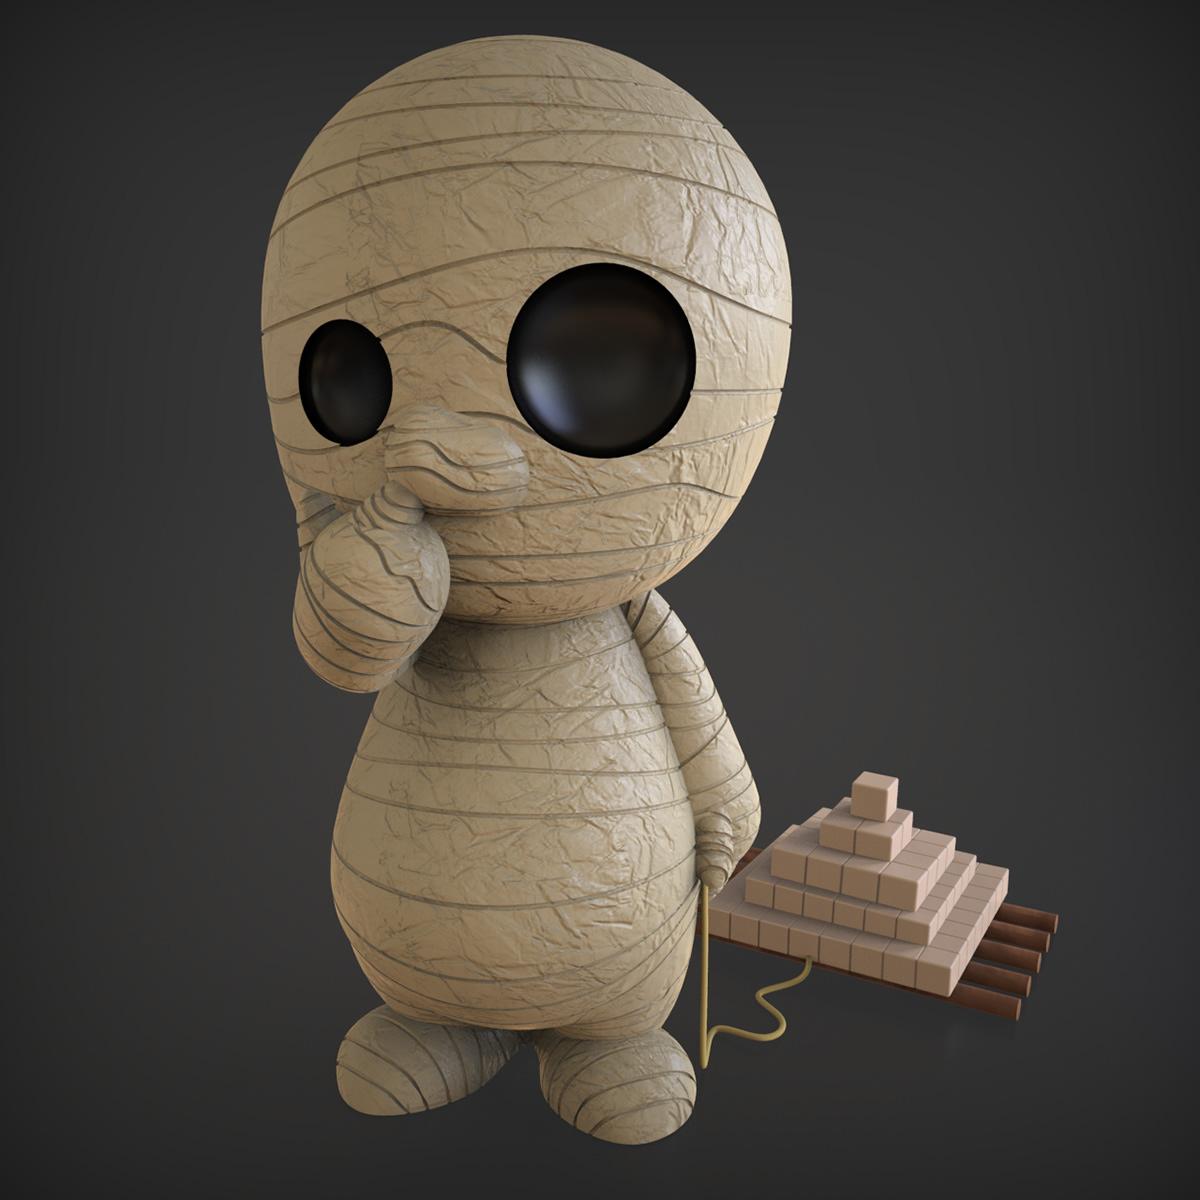 3d print monsters Rhino 3D toys